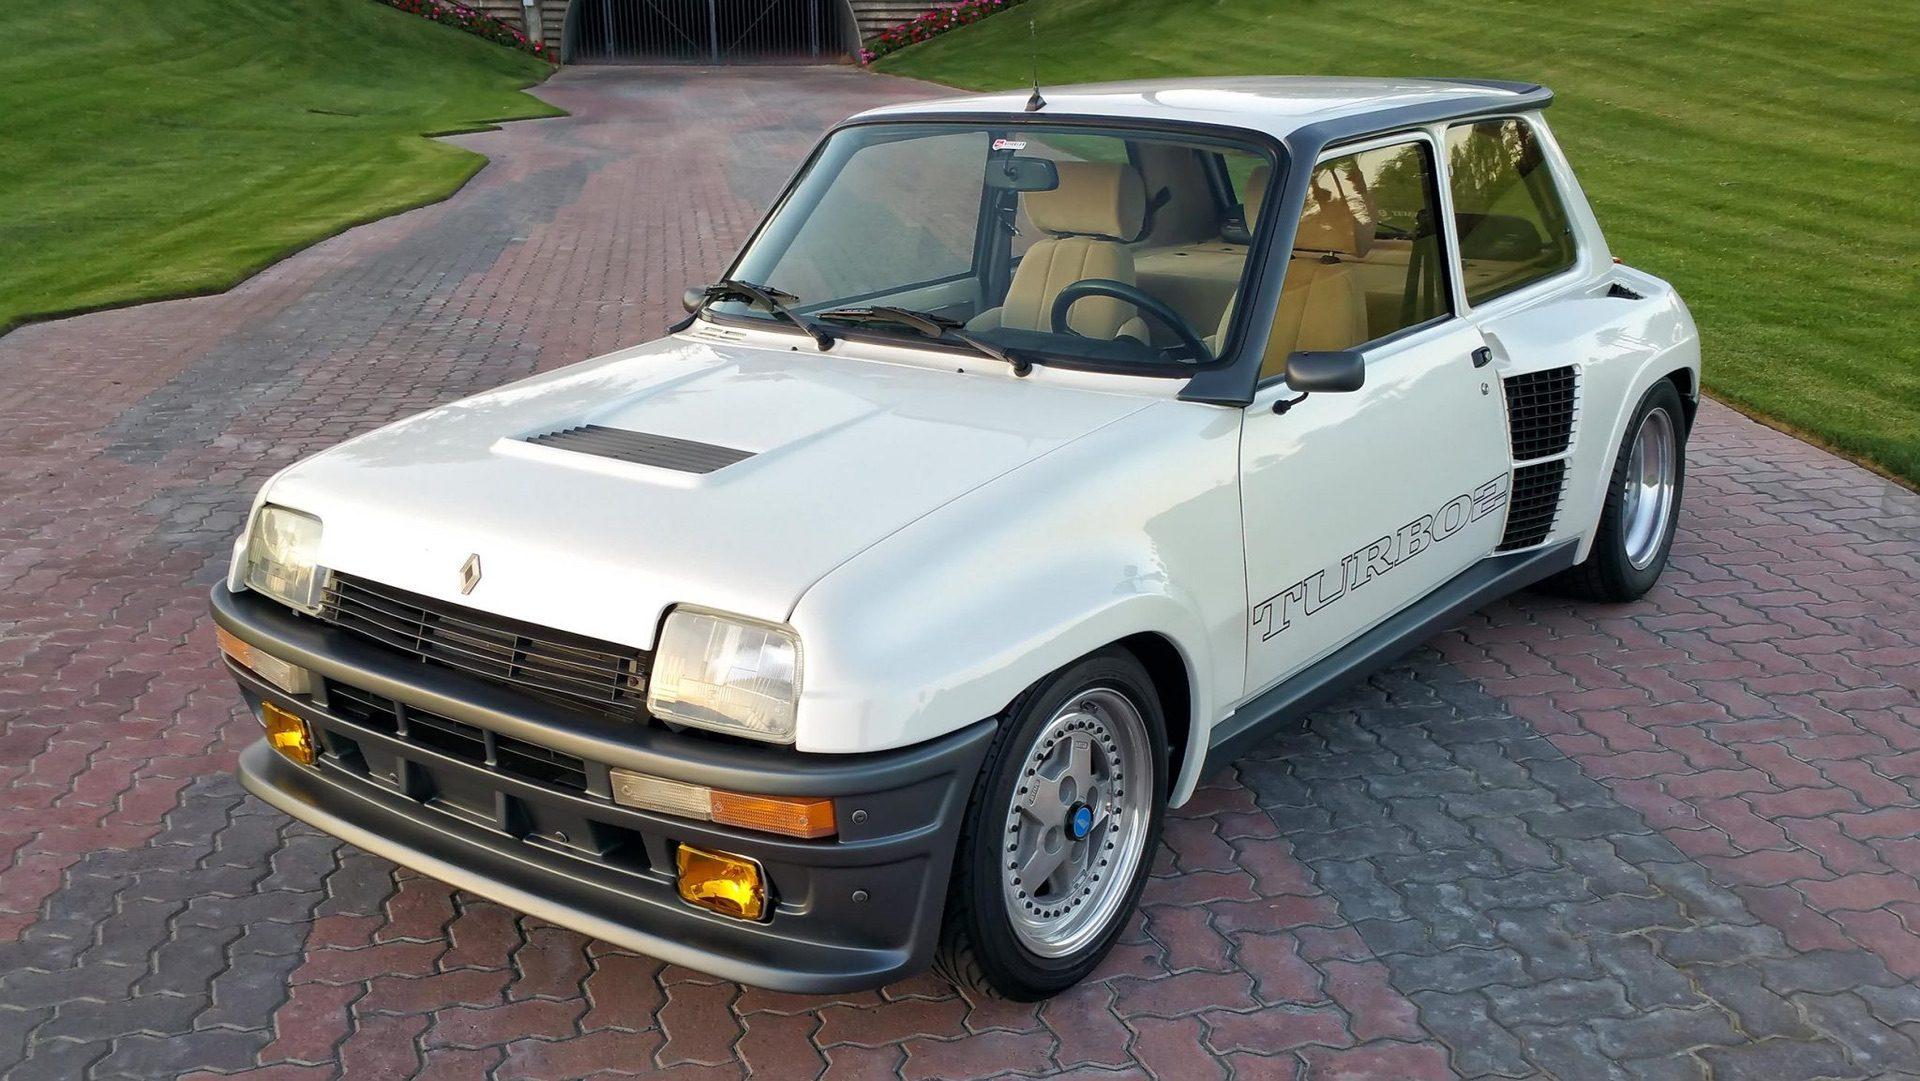 1985_Renault_R5_Turbo_2_rotary-0021